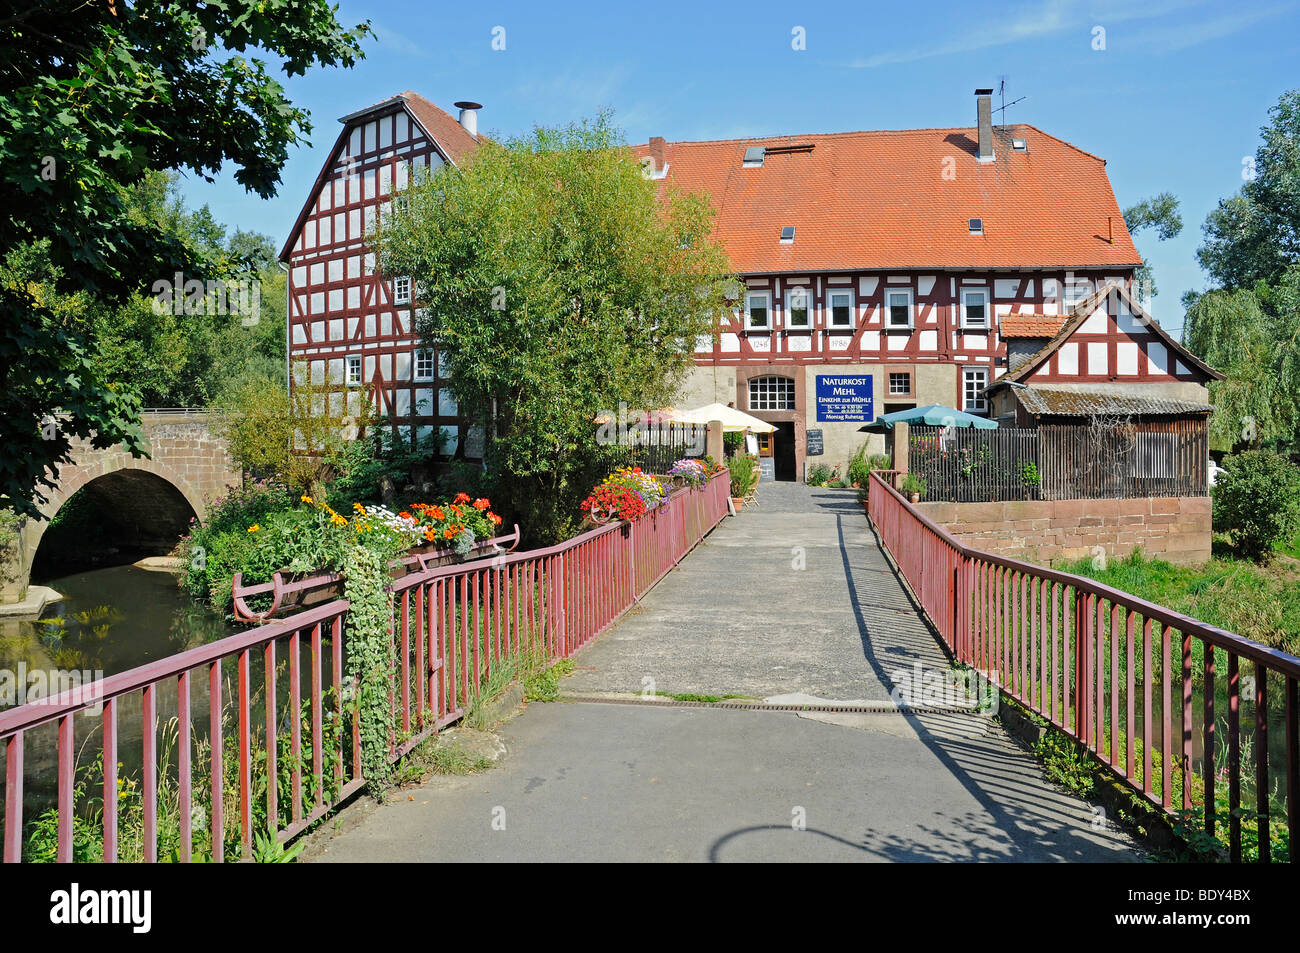 Historic half-timbered house, Bruecker mill, water mill, Amoeneburg, Kassel, Hesse, Germany, Europe - Stock Image